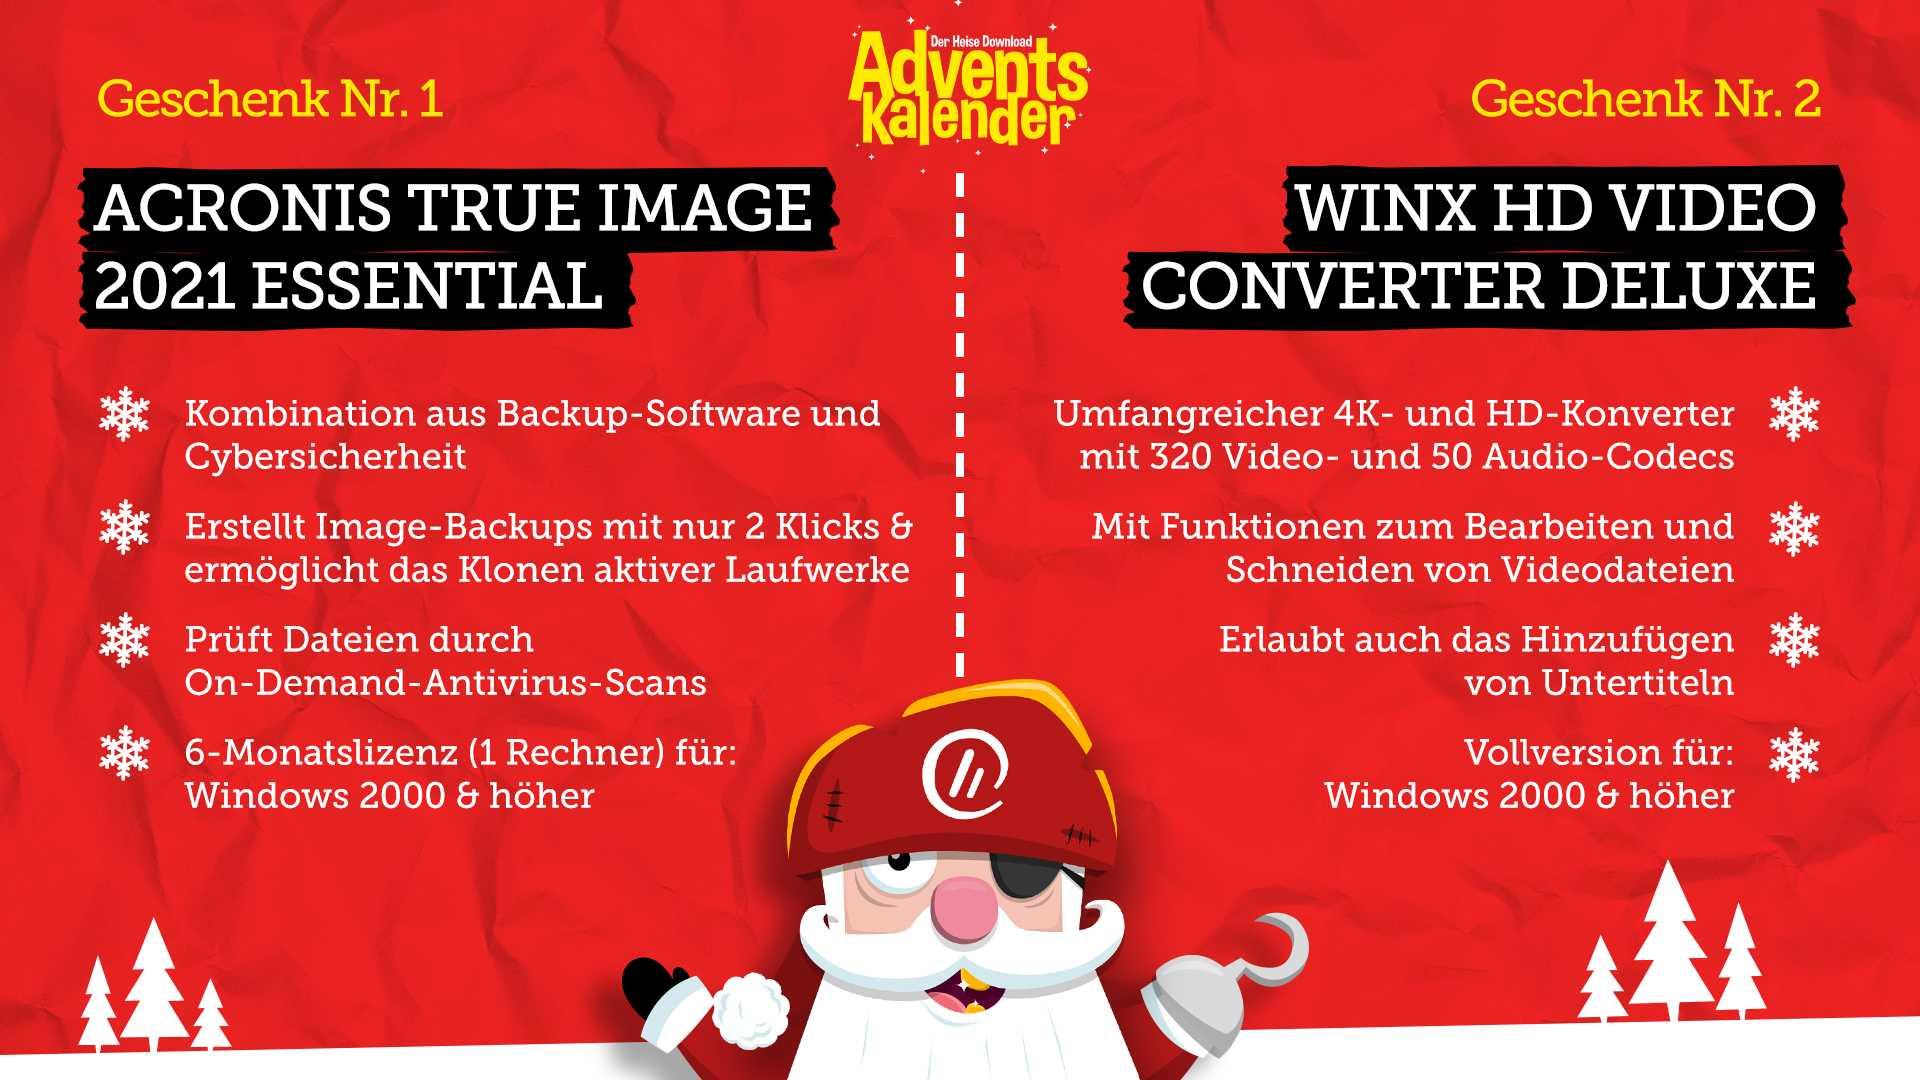 heise: Adventskalender: Türchen 8: Acronis True Image 2021 Essential & WinX HD Video Converter Deluxe